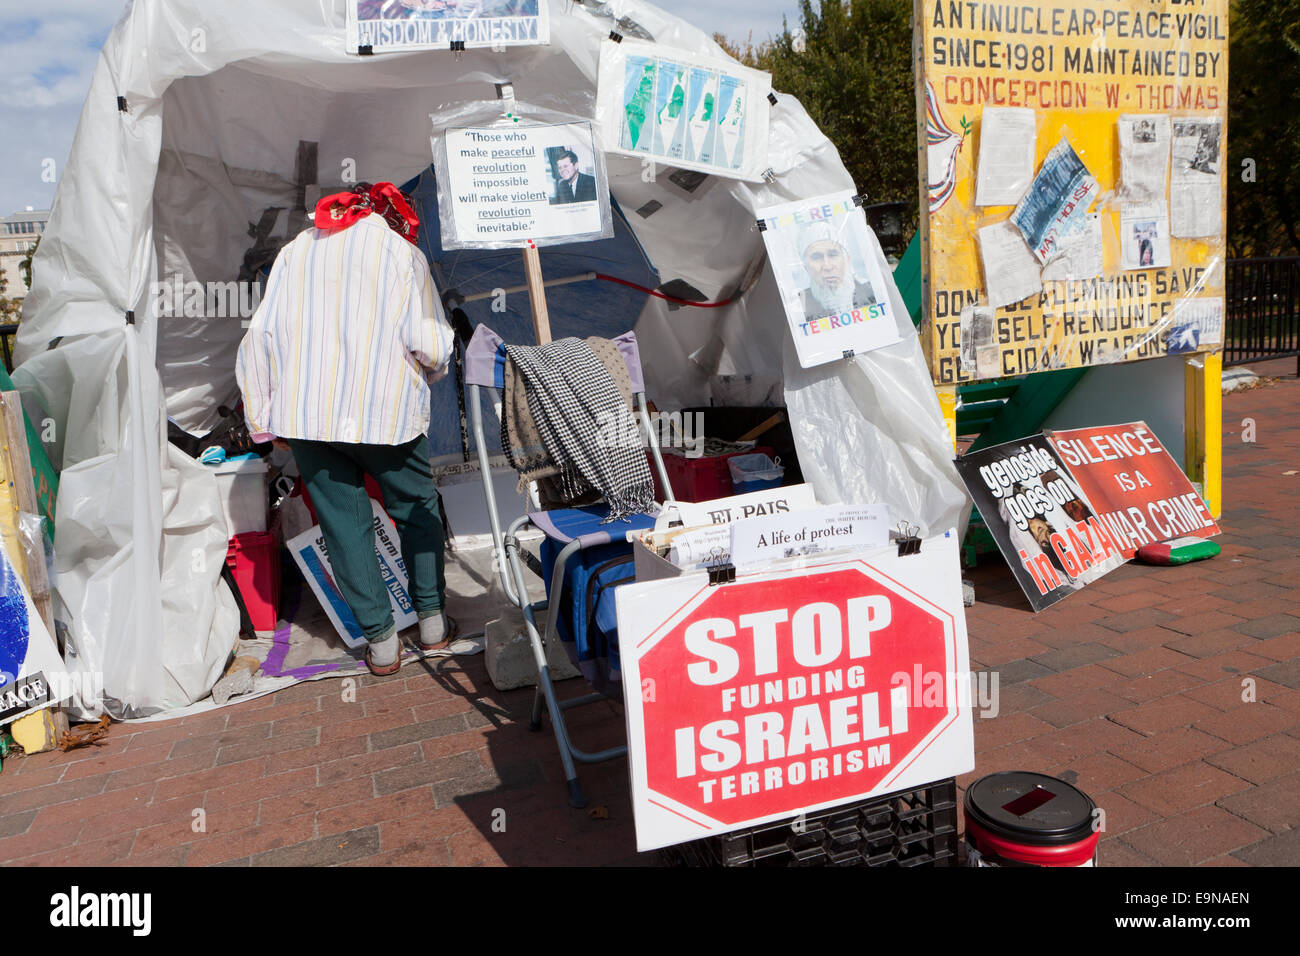 Concepcion Picciotto, activiste de la paix - Washington, DC USA Photo Stock